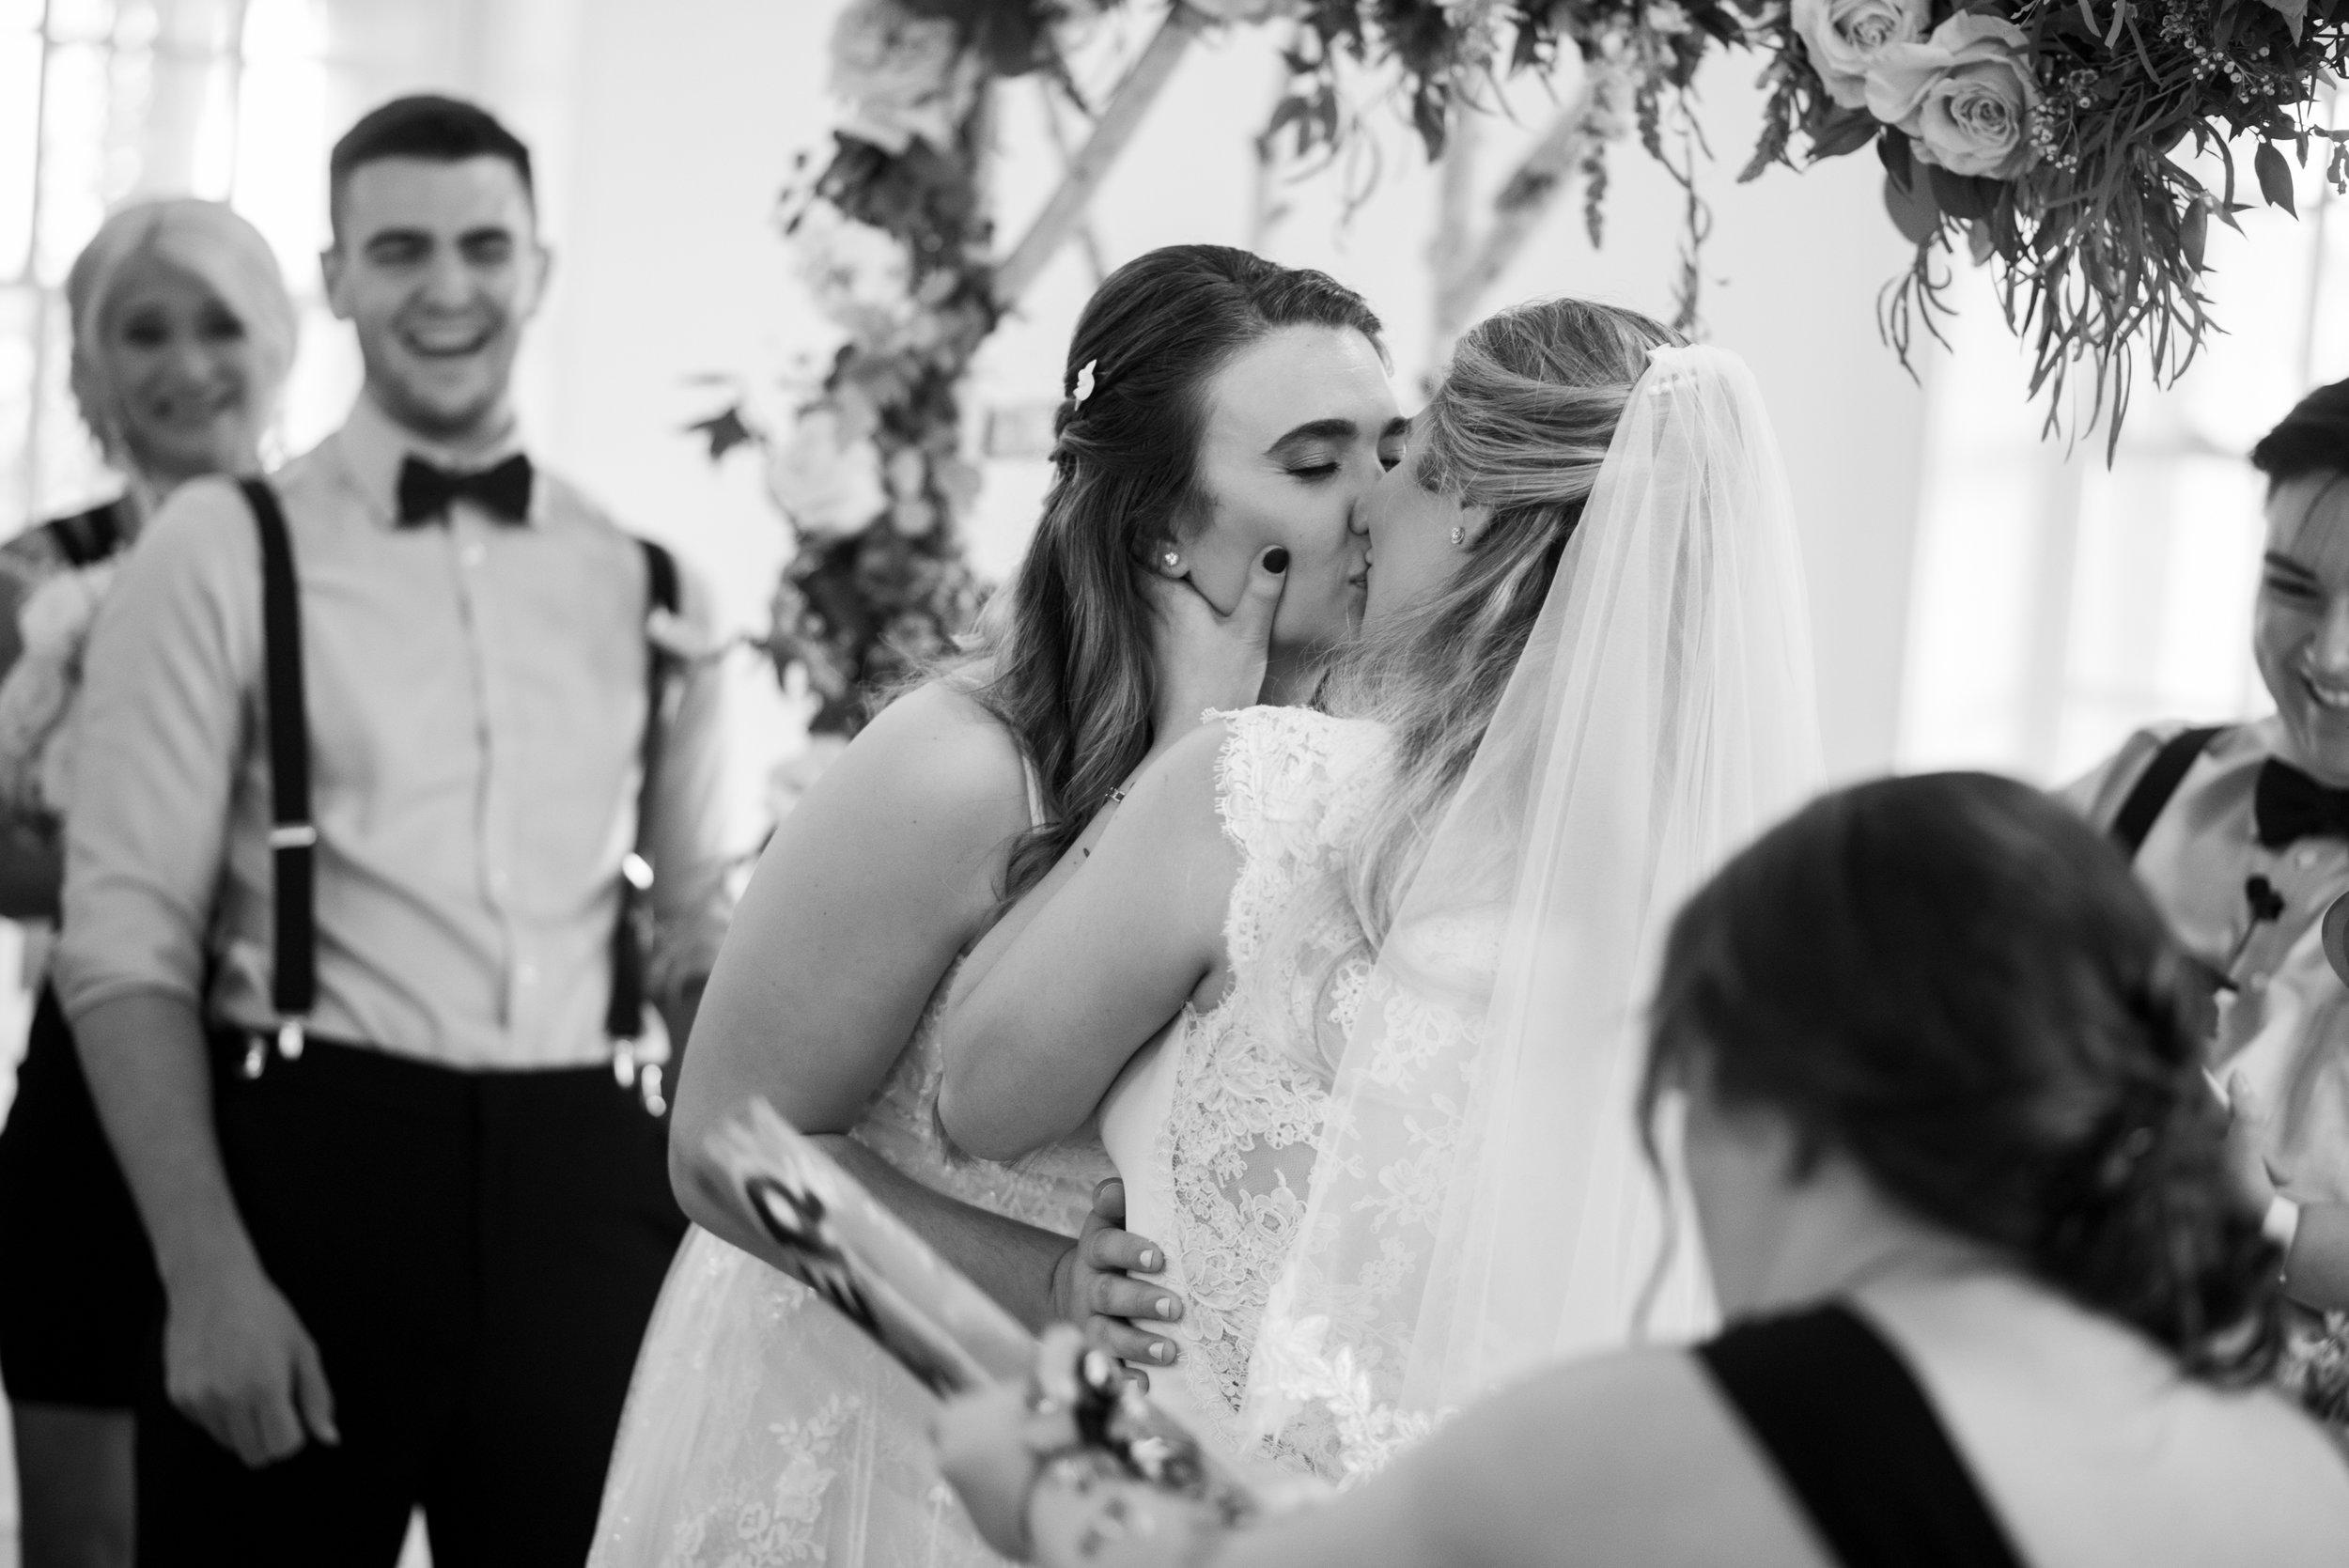 st-augustine-photographer-st-augustine-gay-wedding-sam-sex-wedding-photographer-sarah-annay-photography-white-room-weddings-30.jpg